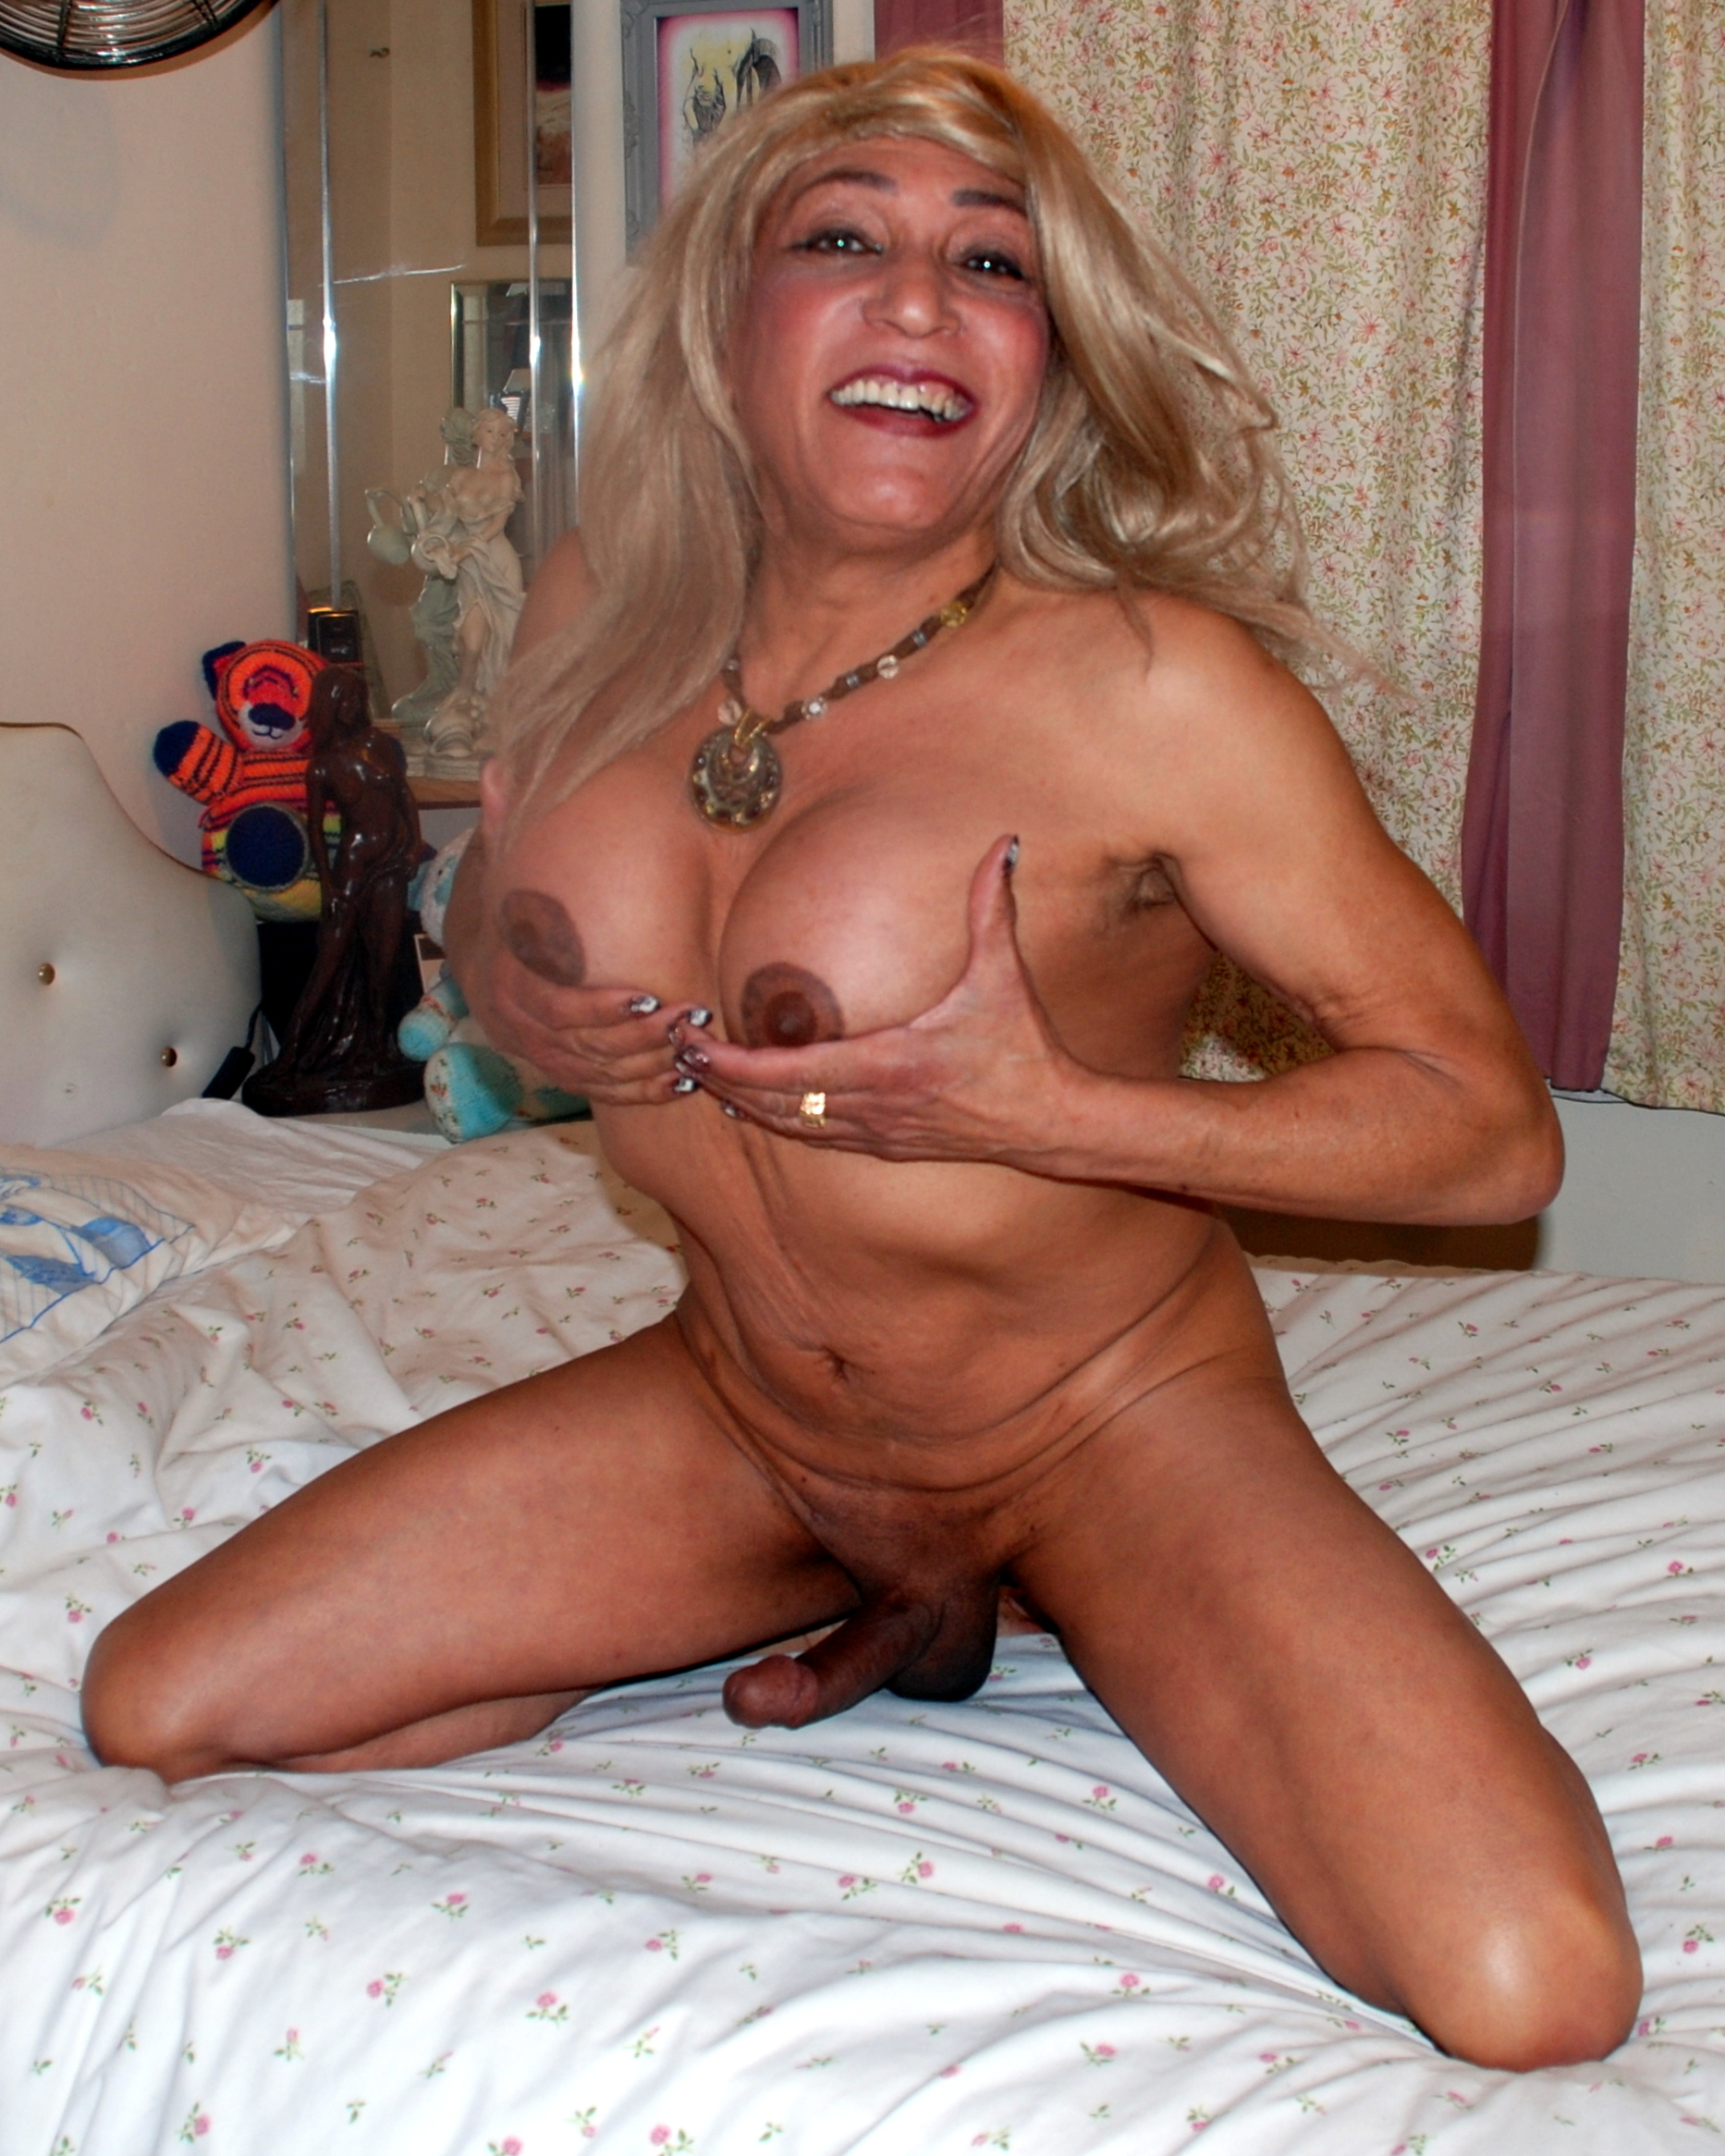 Amateur Tranny Porn mature shemale slut pippa shemale on yuvutu homemade amateur